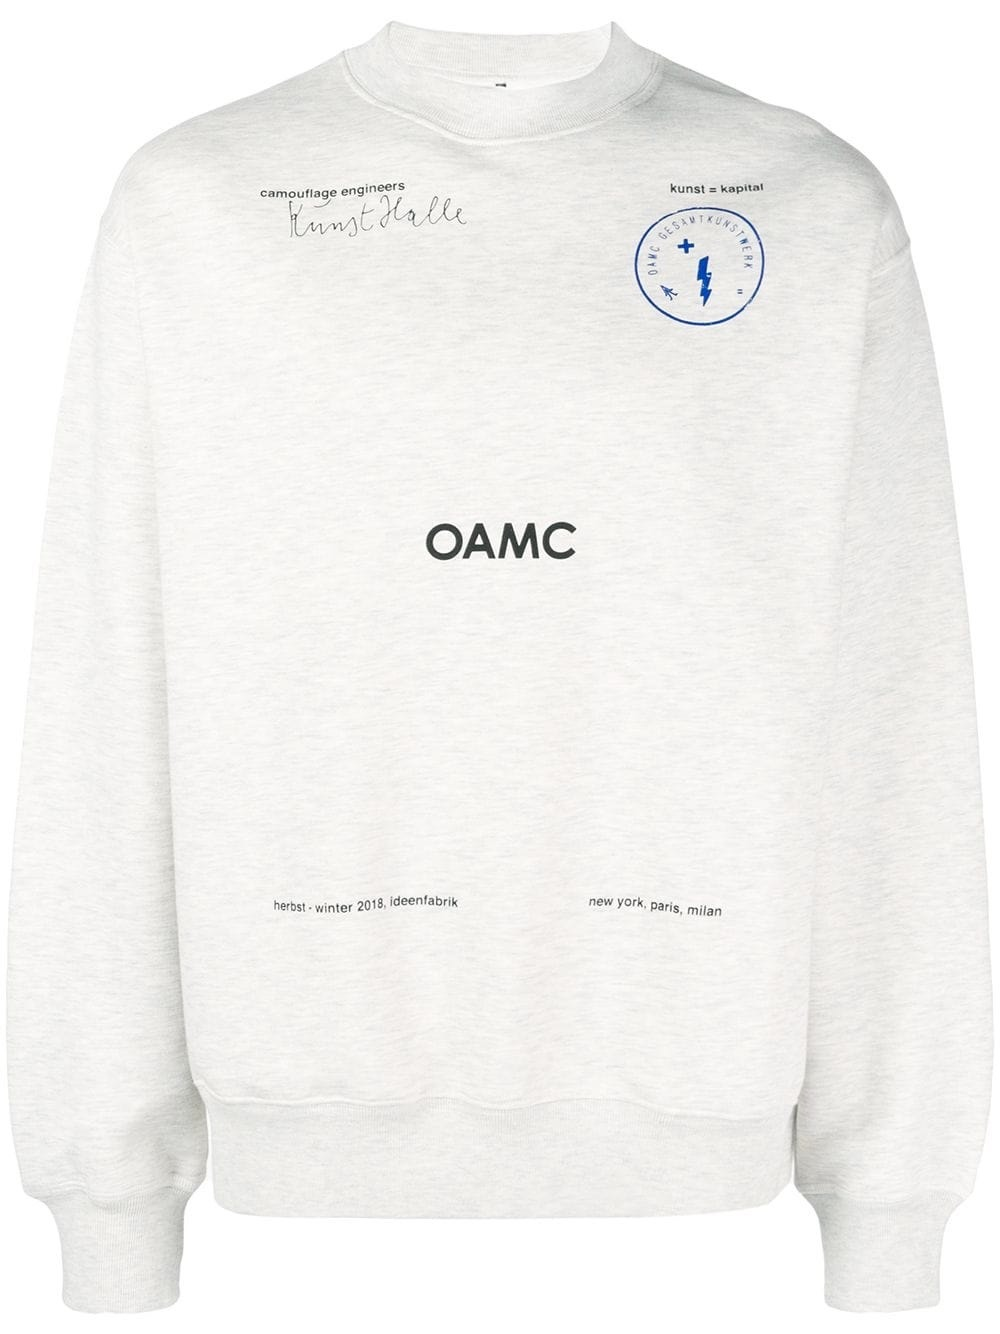 OAMC Kunsthalle Crewneck Black – Feature